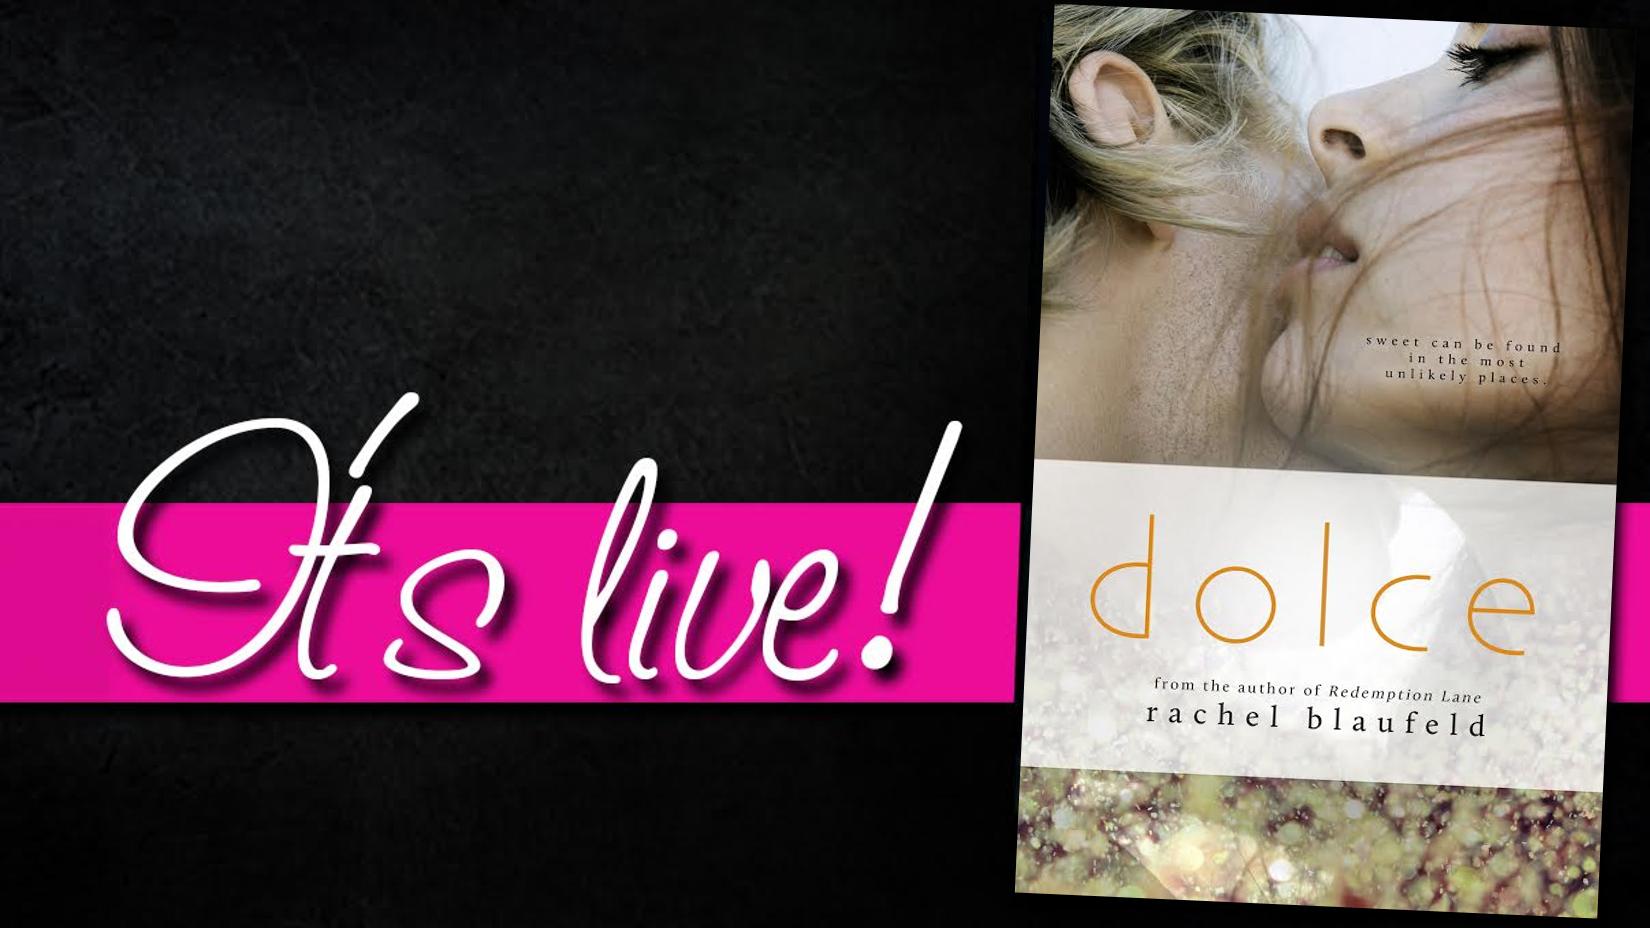 Blog Tour Excerpt: Dolce by Rachel Blaufeld